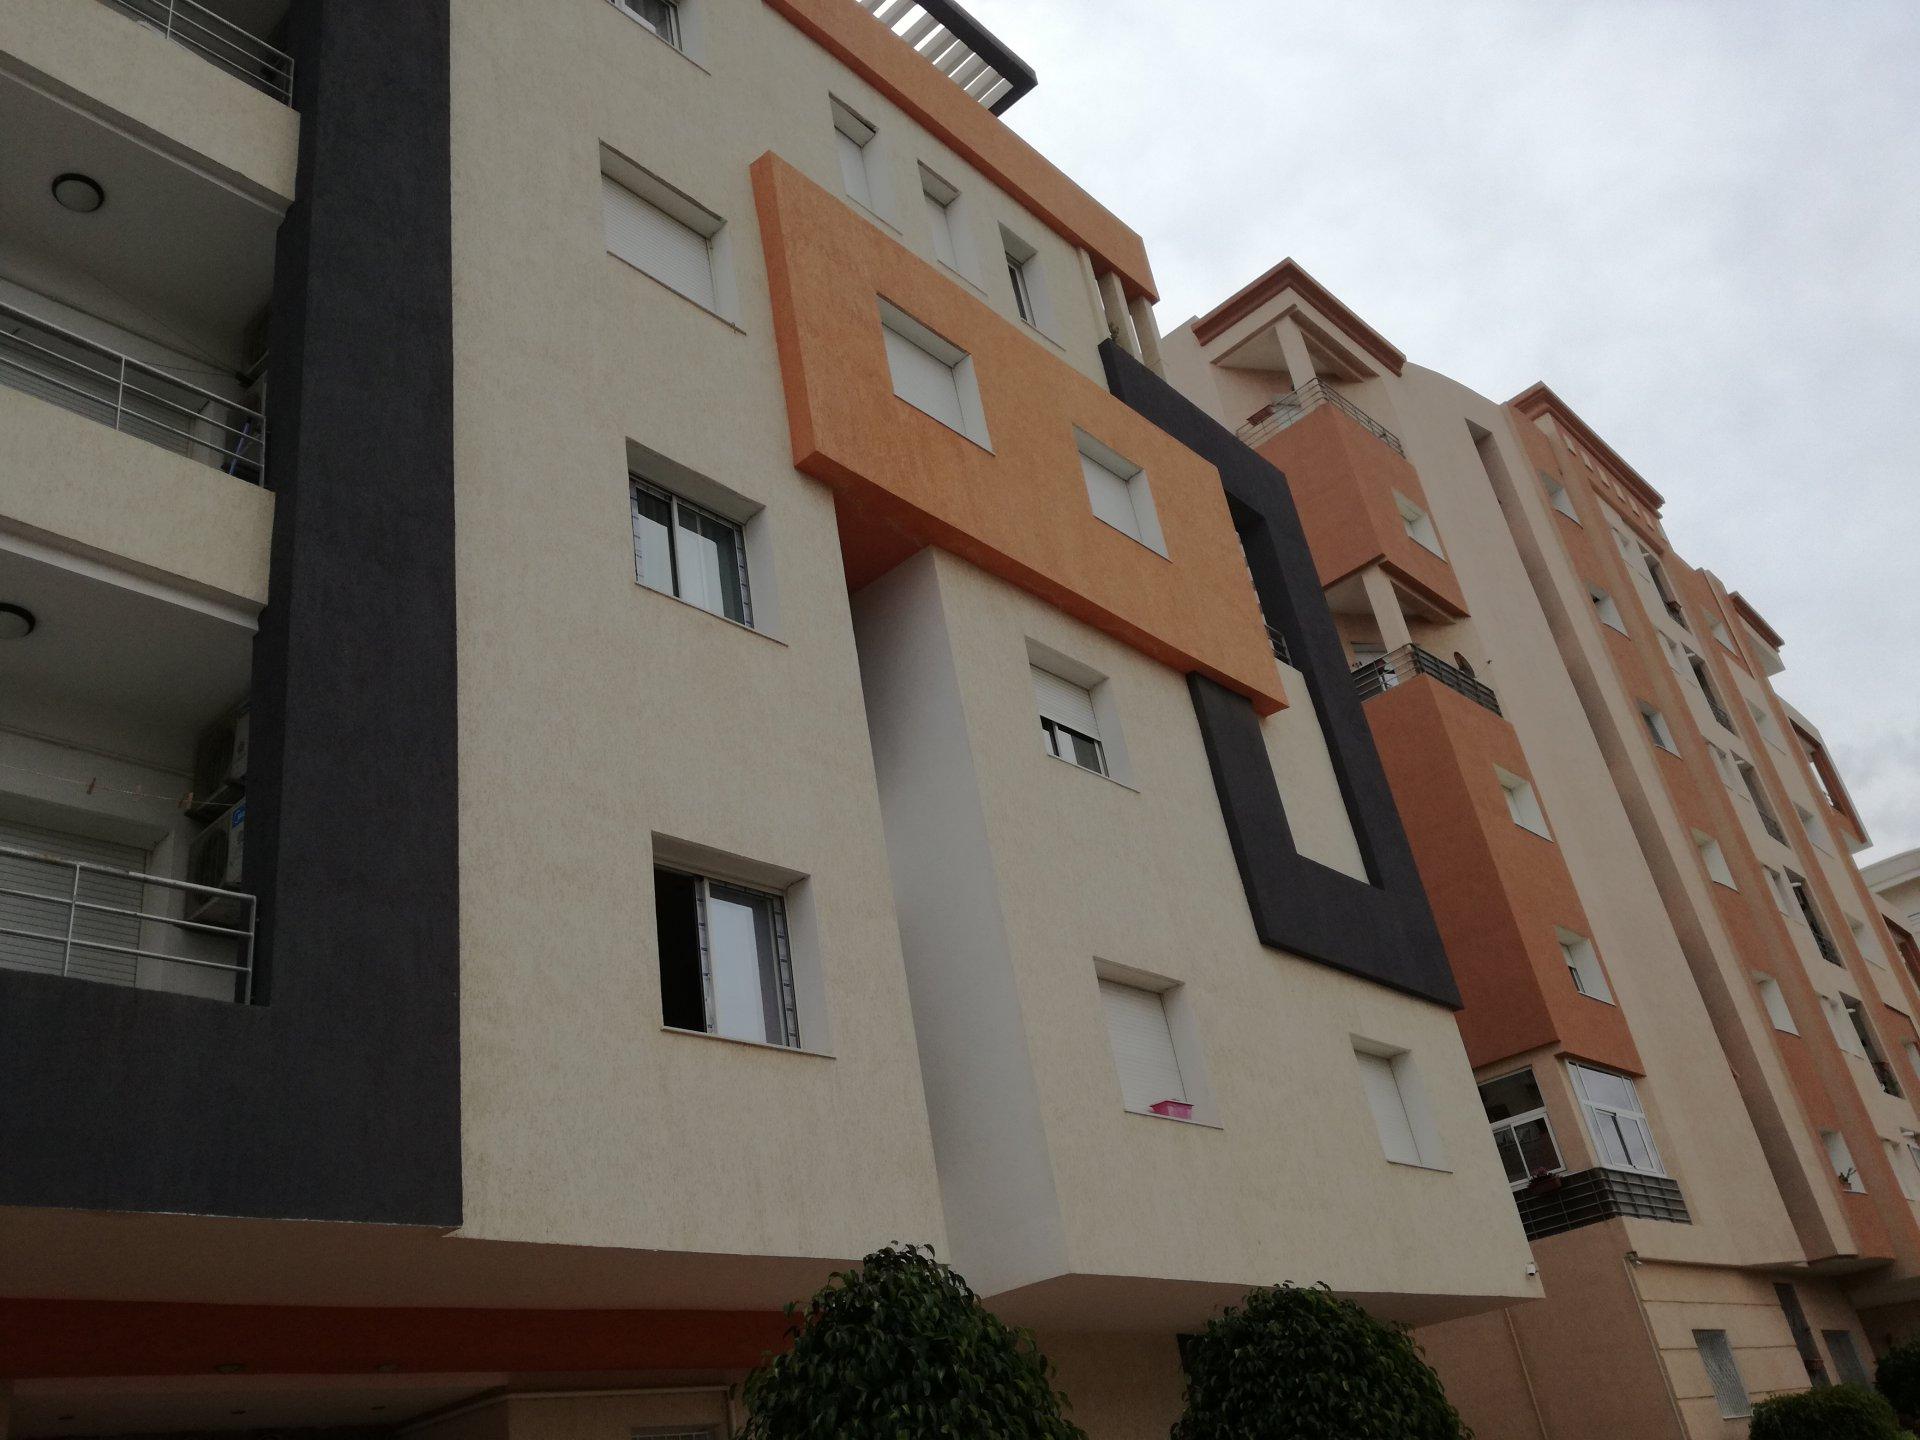 Appartement 3 chambres de standing